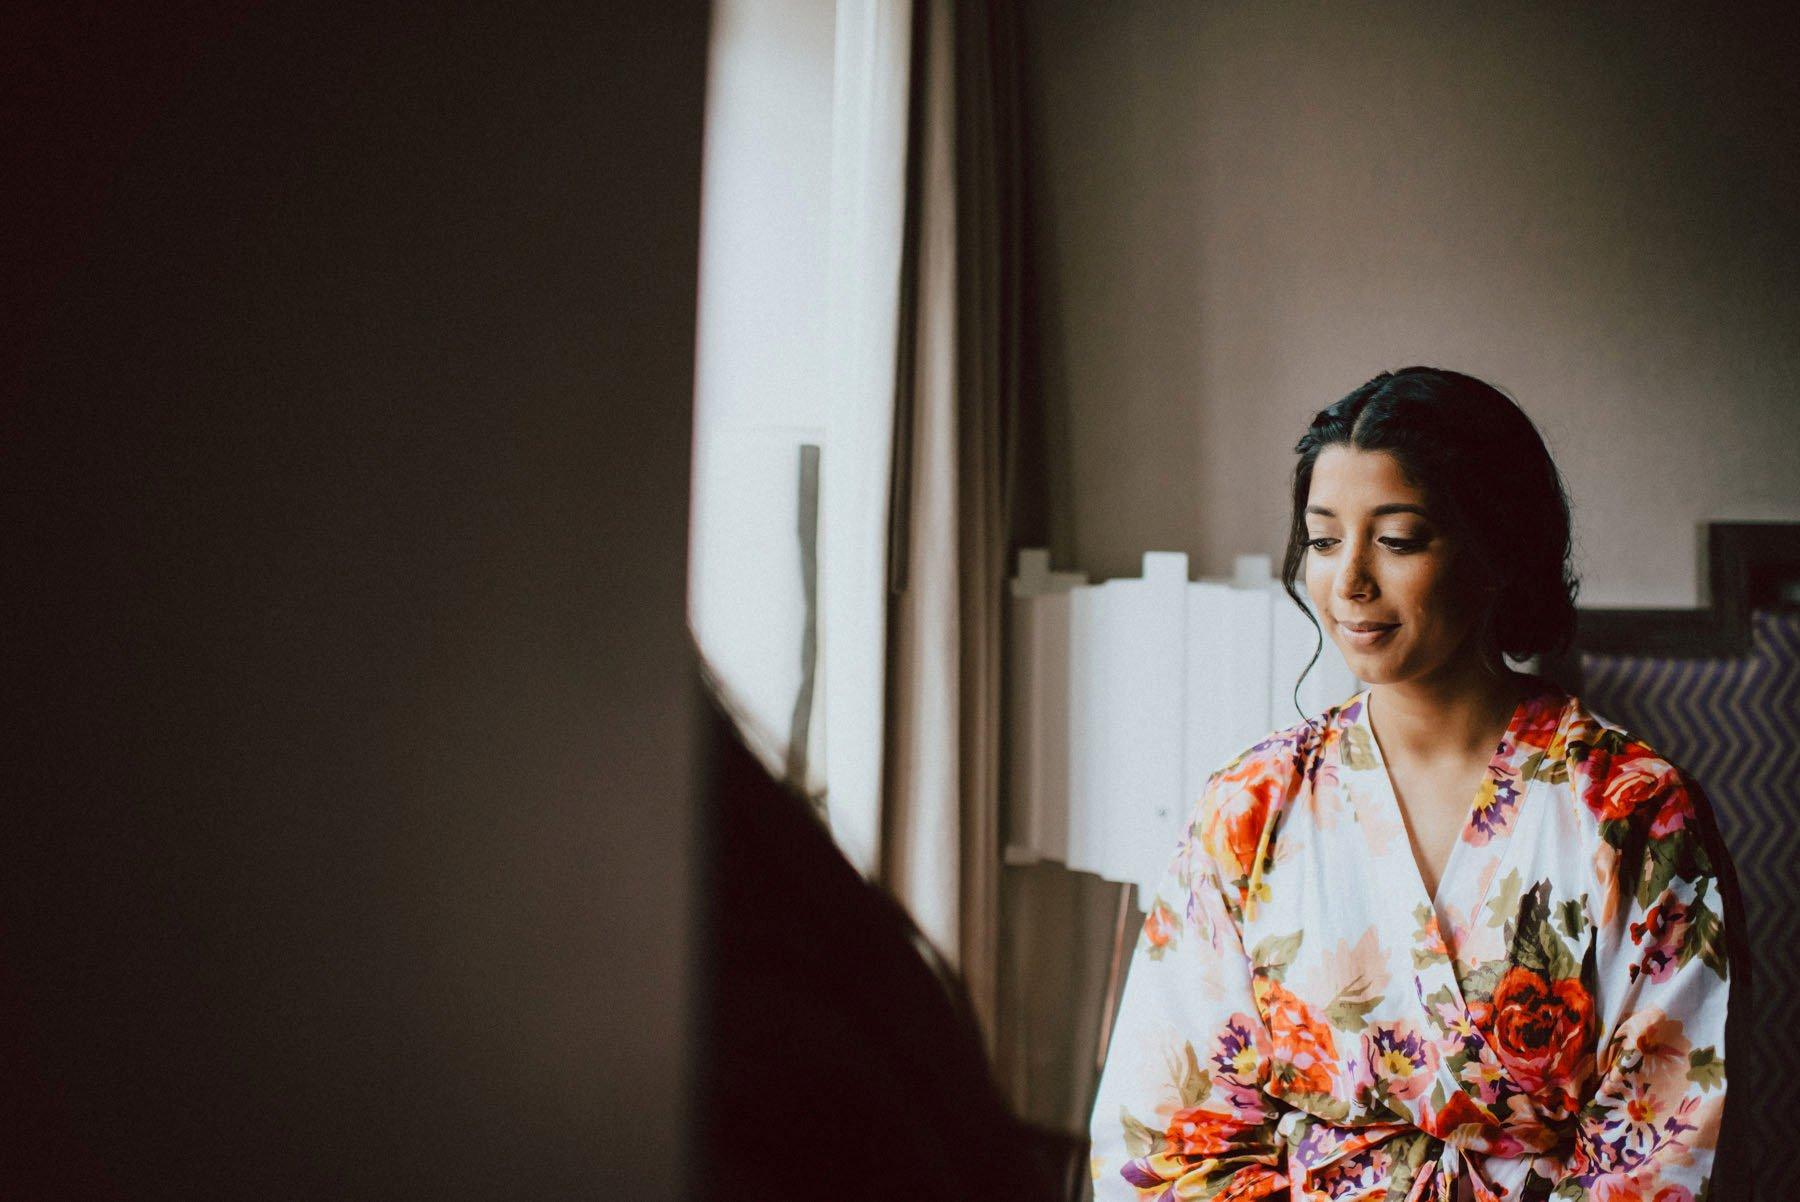 vie-philadelphia-indian-wedding-1.jpg